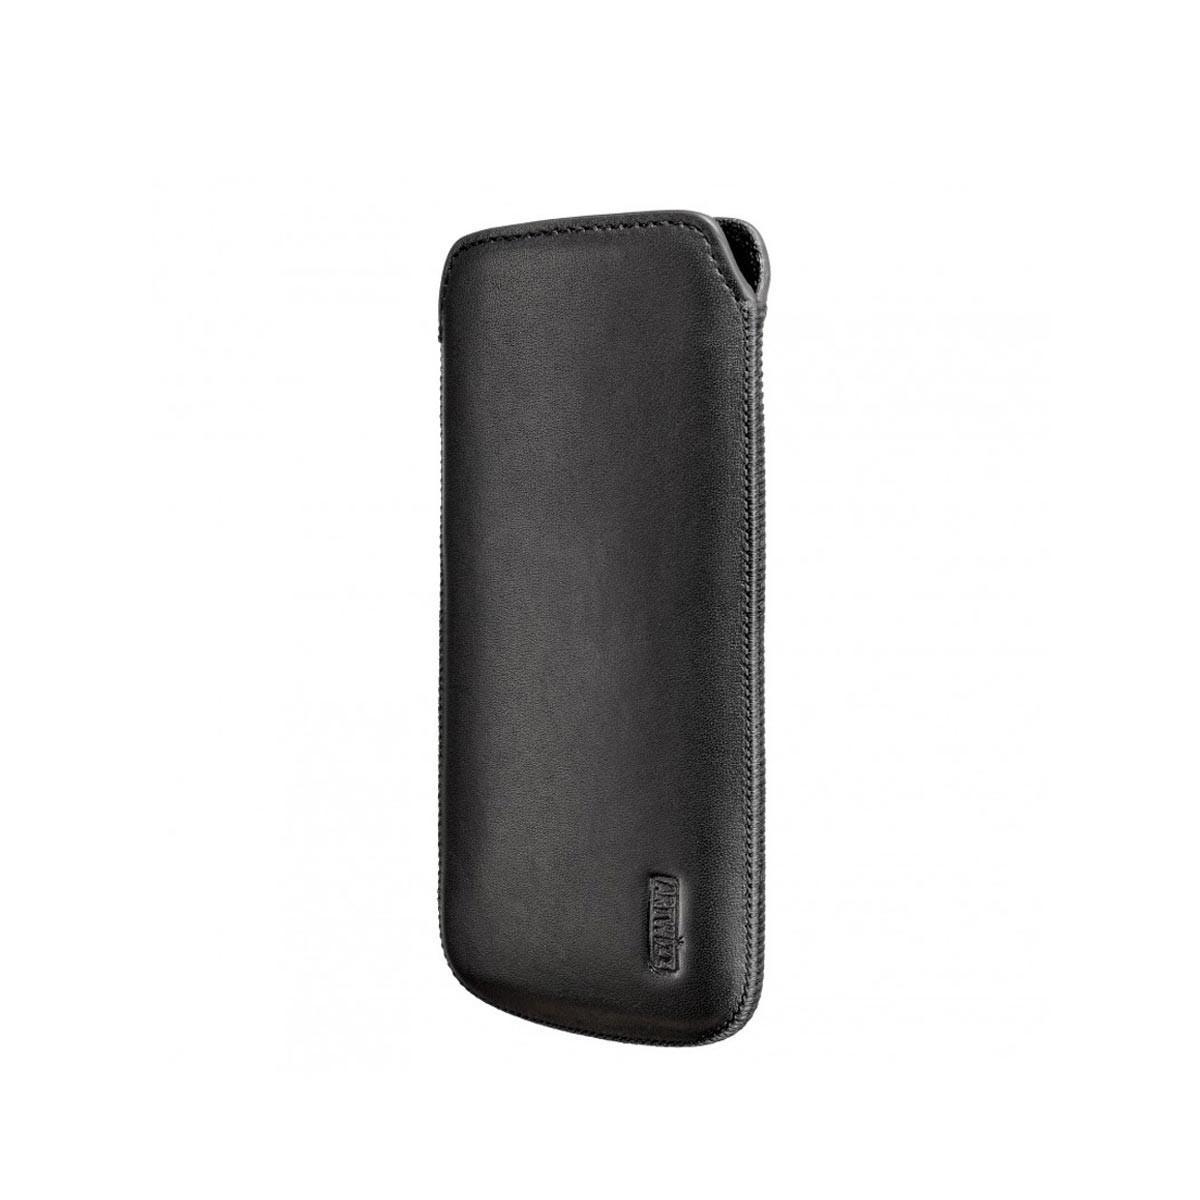 Artwizz - Leather Pouch iPhone 5/5s/5c becsúsztatós bőrtok - fekete